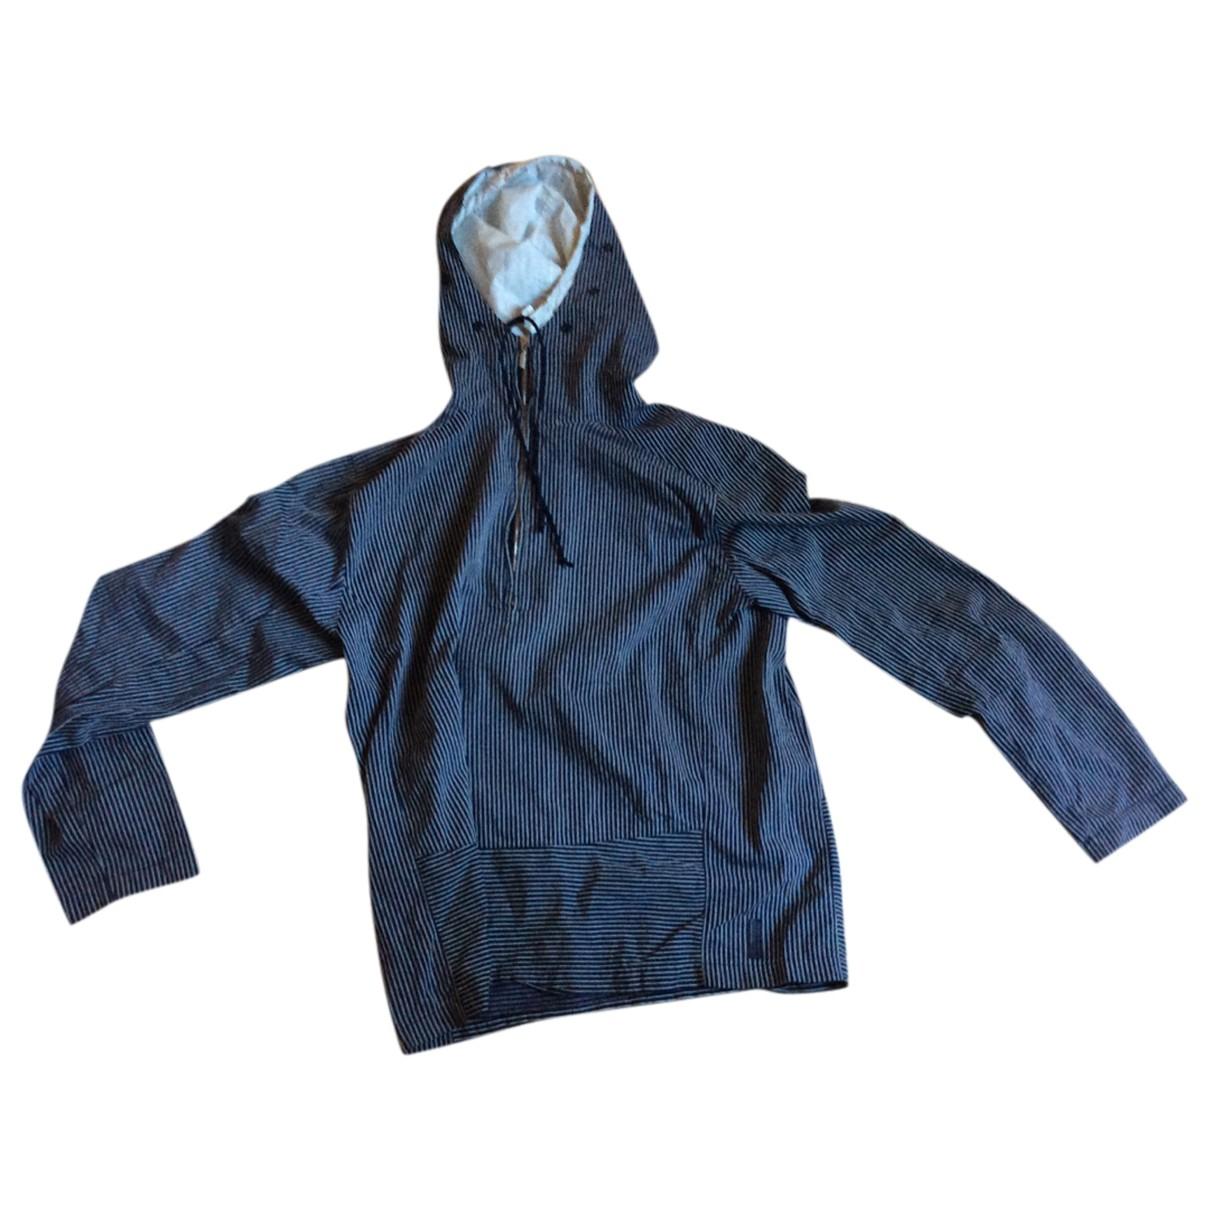 Giorgio Armani - Vestes.Blousons   pour homme en coton - bleu